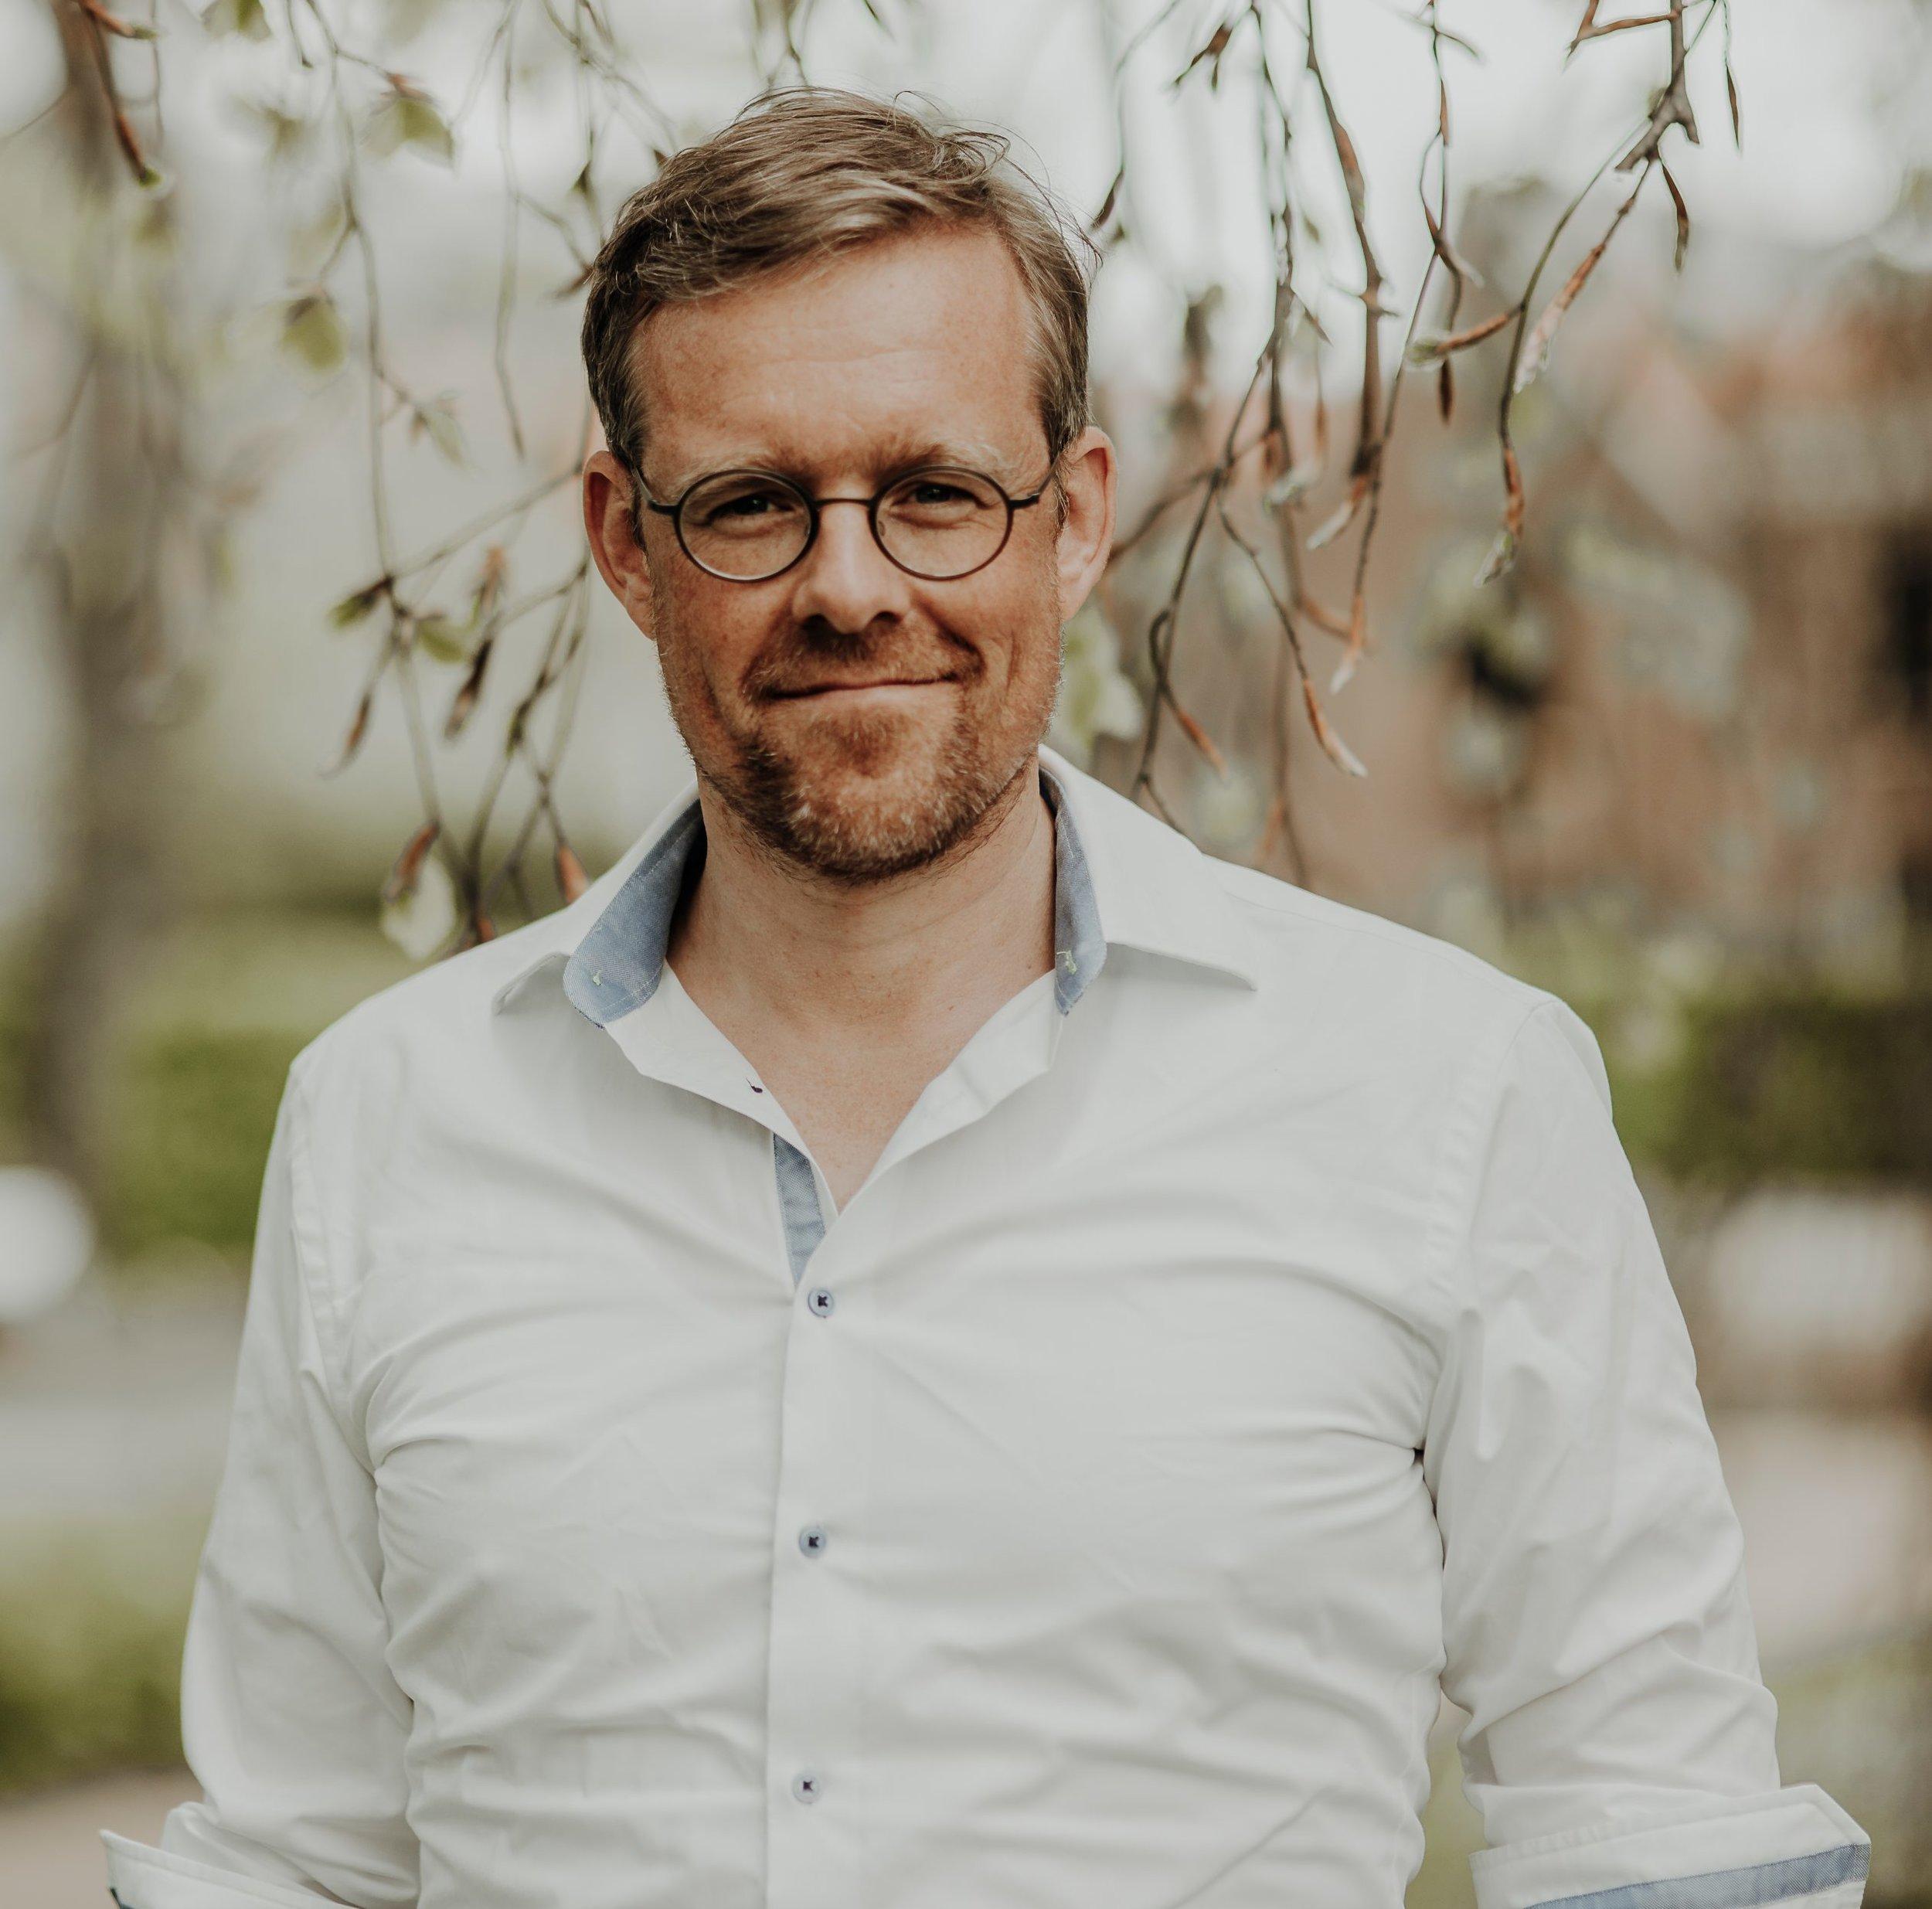 Hugo Suidman - Founder, ForChiefs